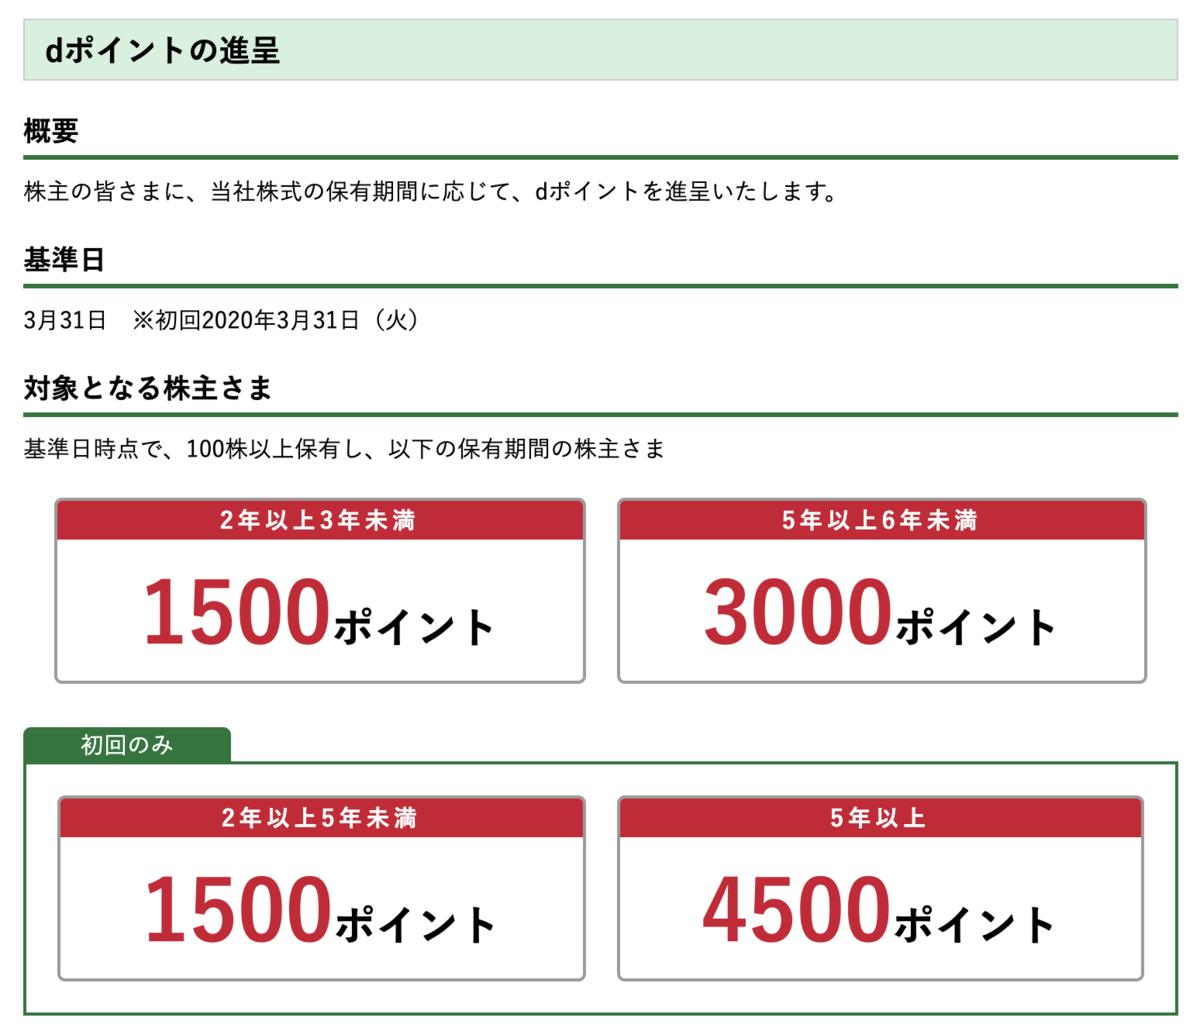 f:id:koala_log:20200623113051p:plain